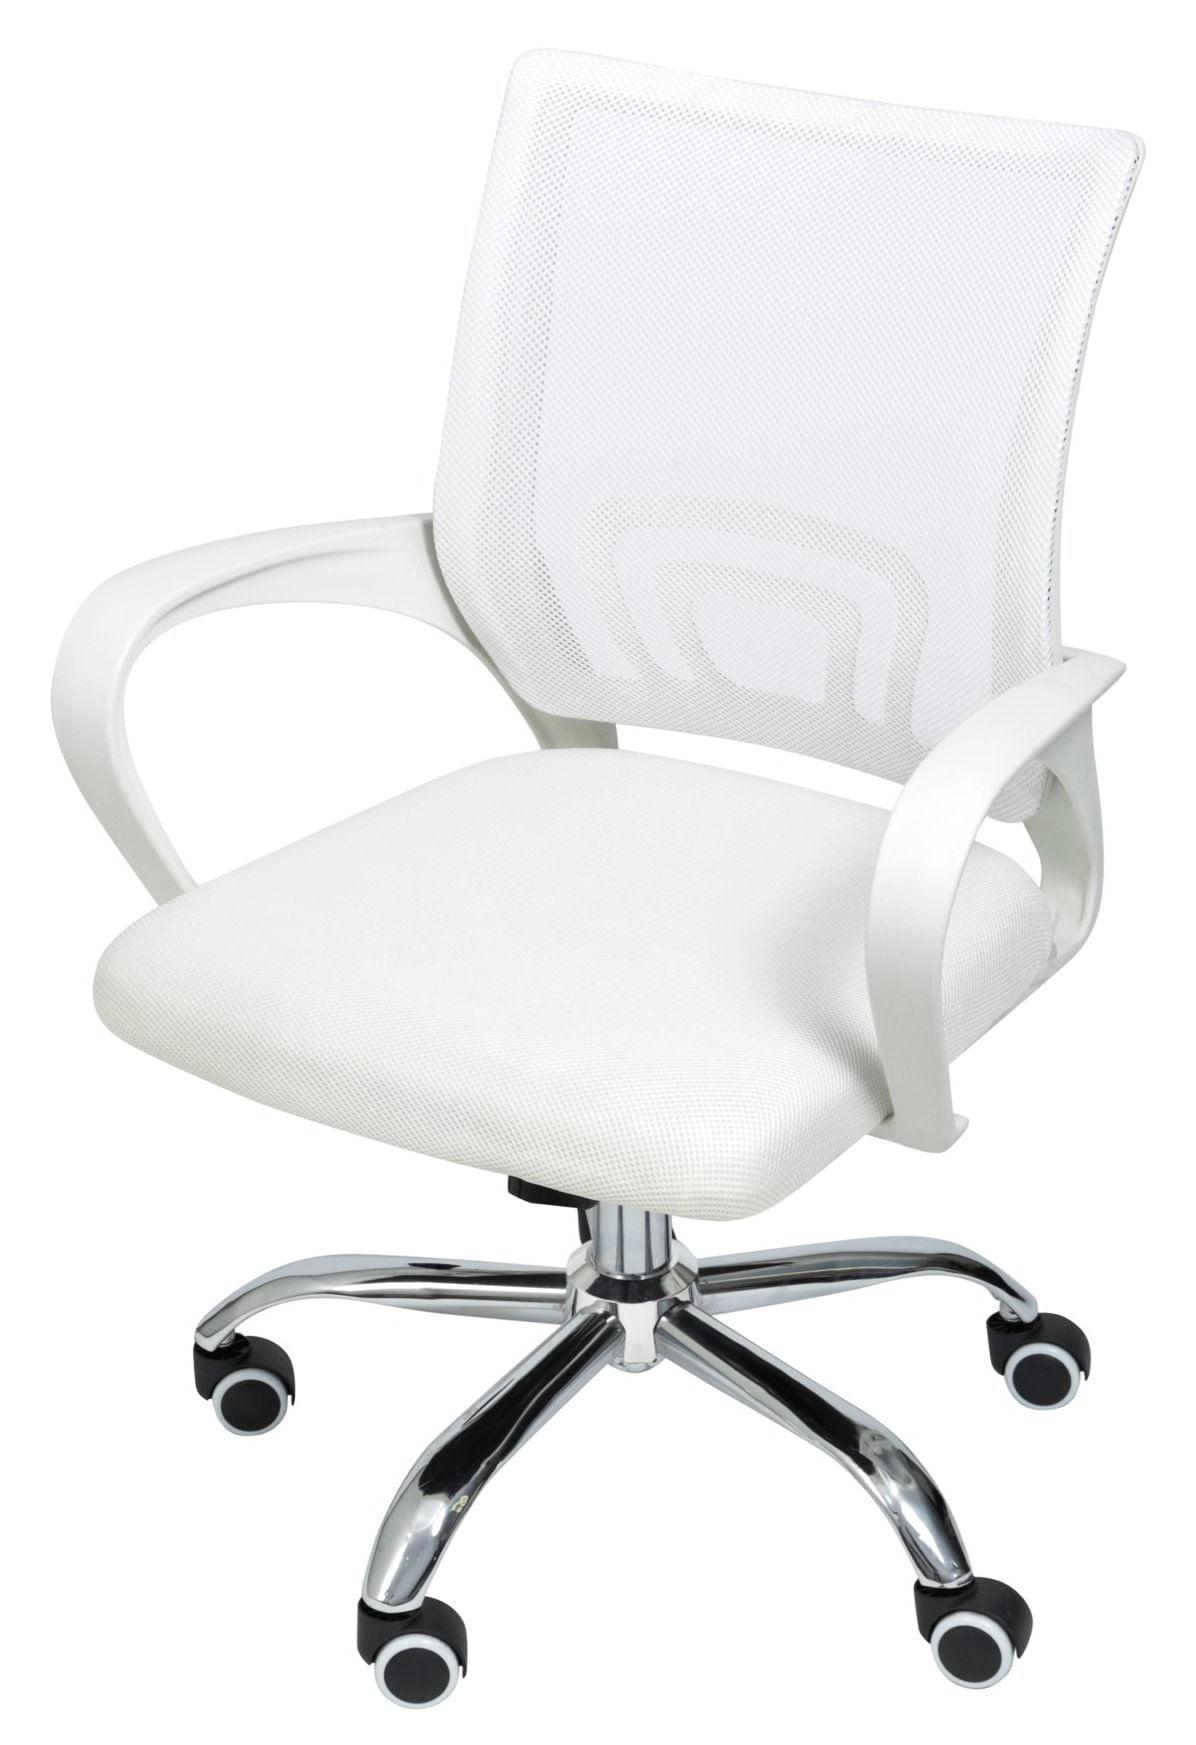 Cadeira Office Osorno Tela Mesh Branca com Base Rodizio Cromada - 47407